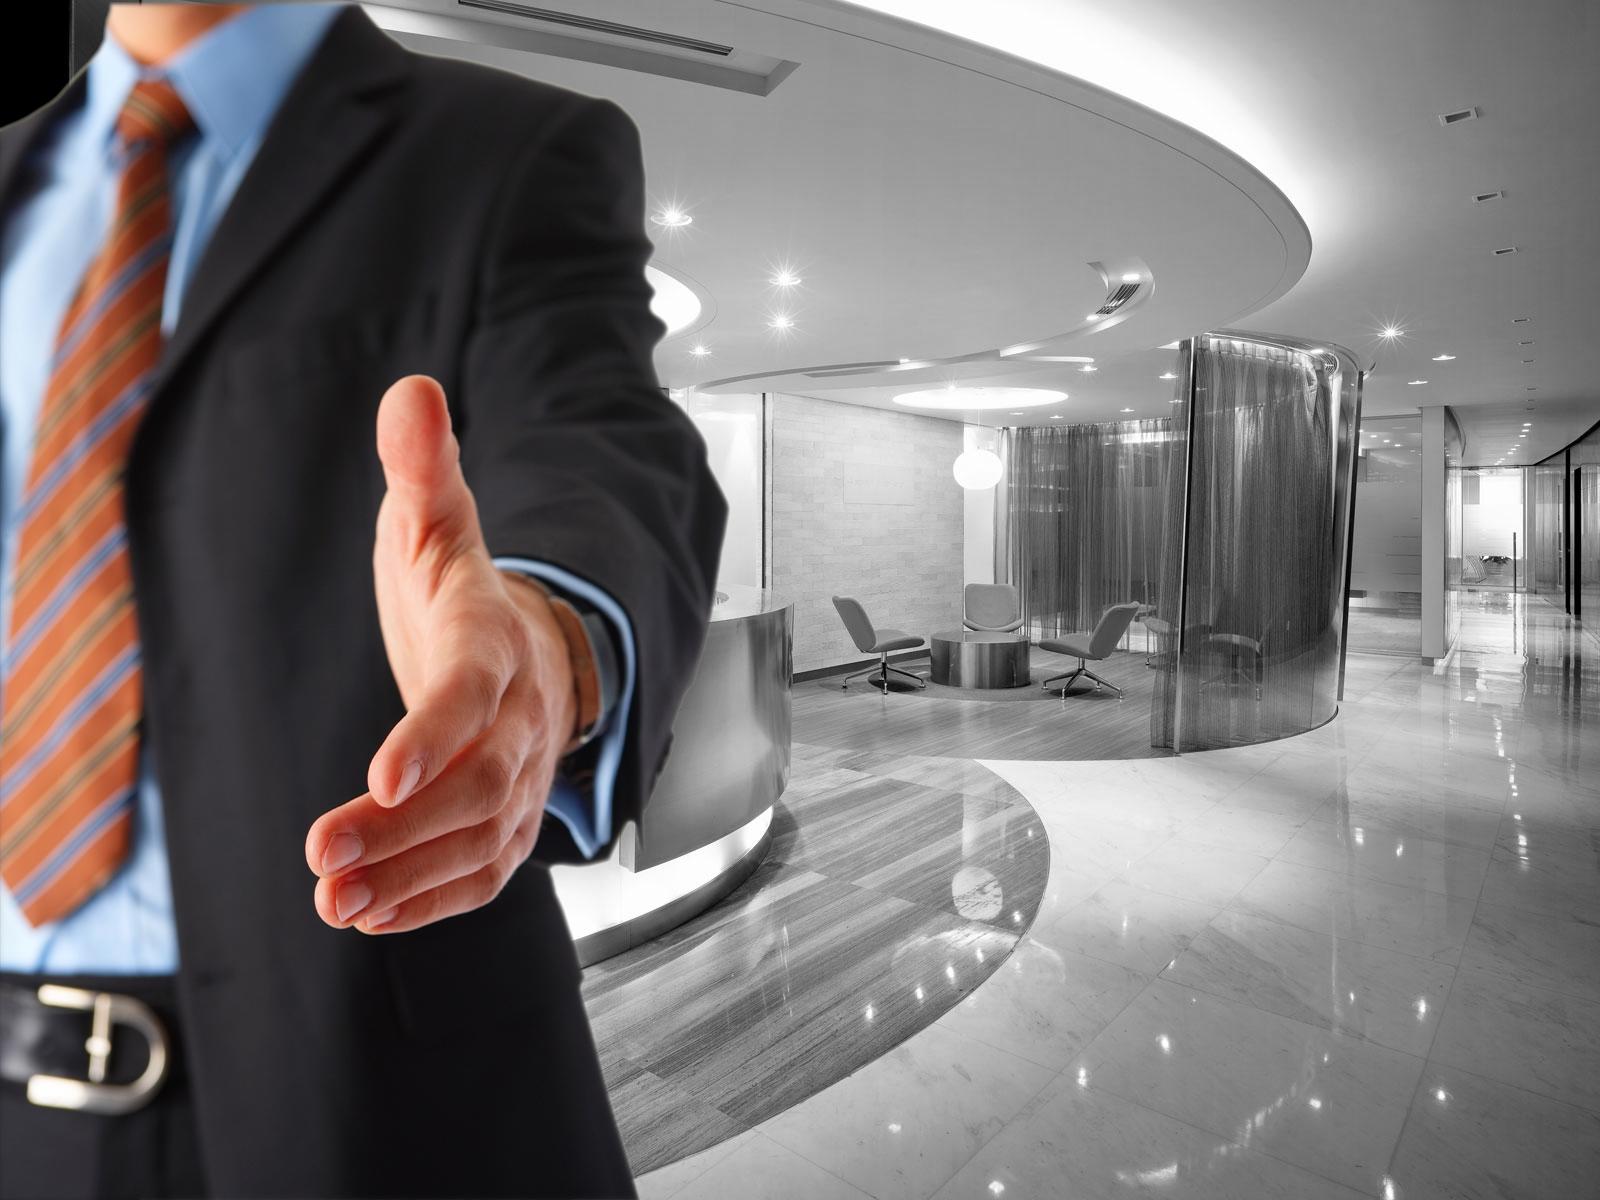 handshakes during job interviews